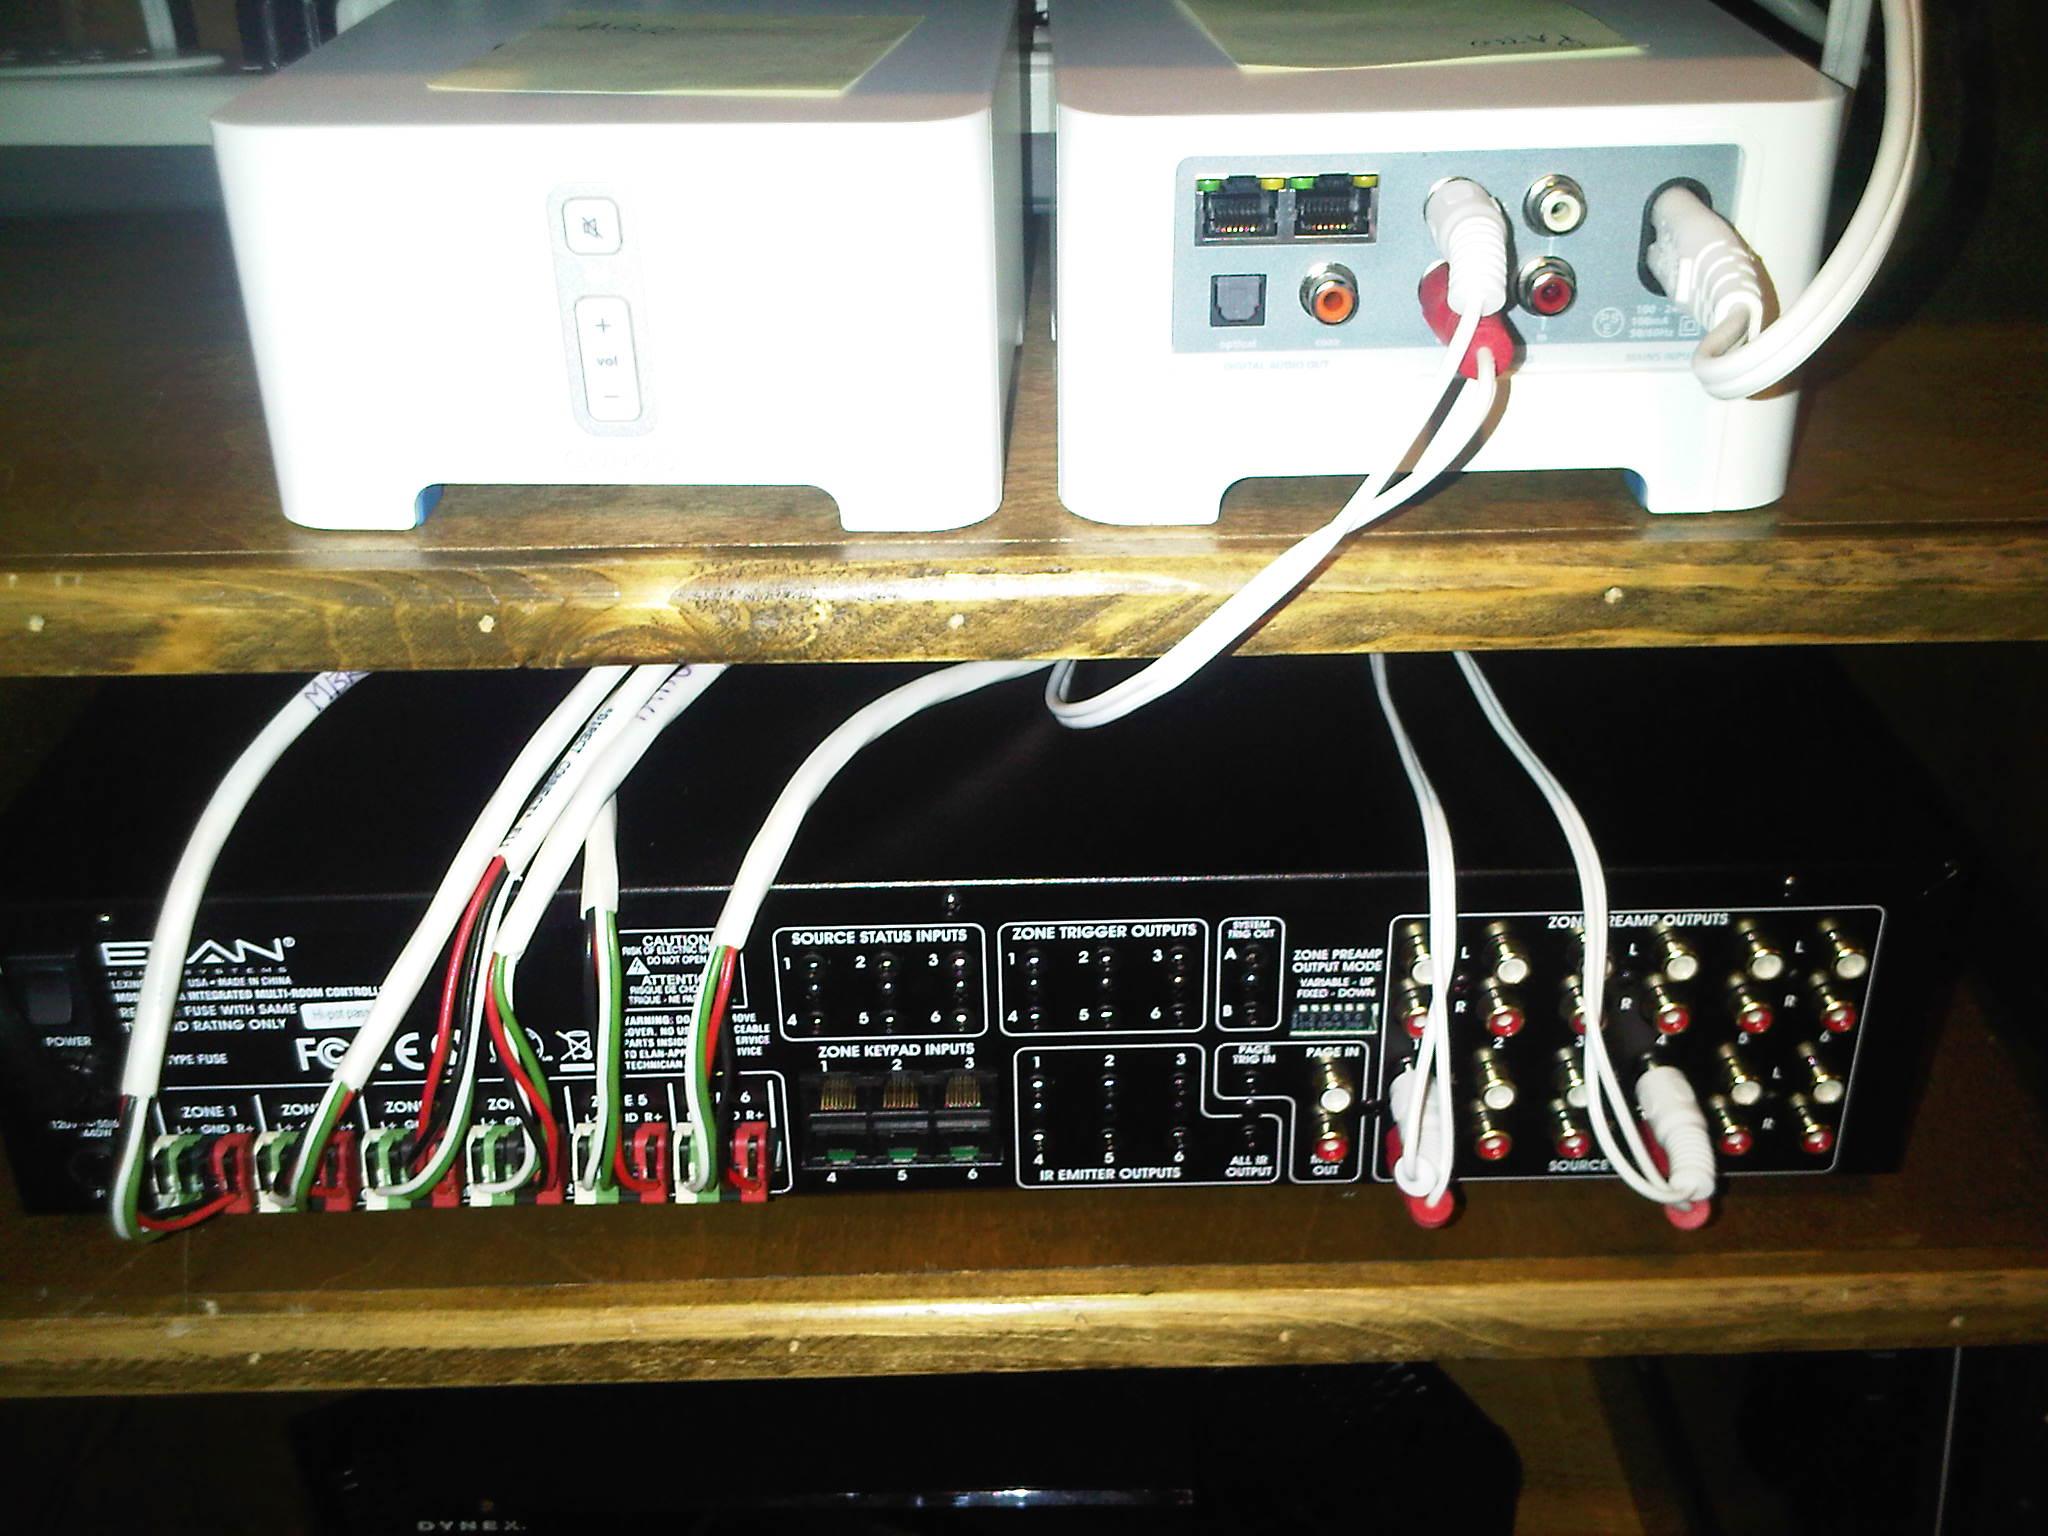 sonos connect wiring diagram 7 way blade how do you program an elan s66a multi room controller i want